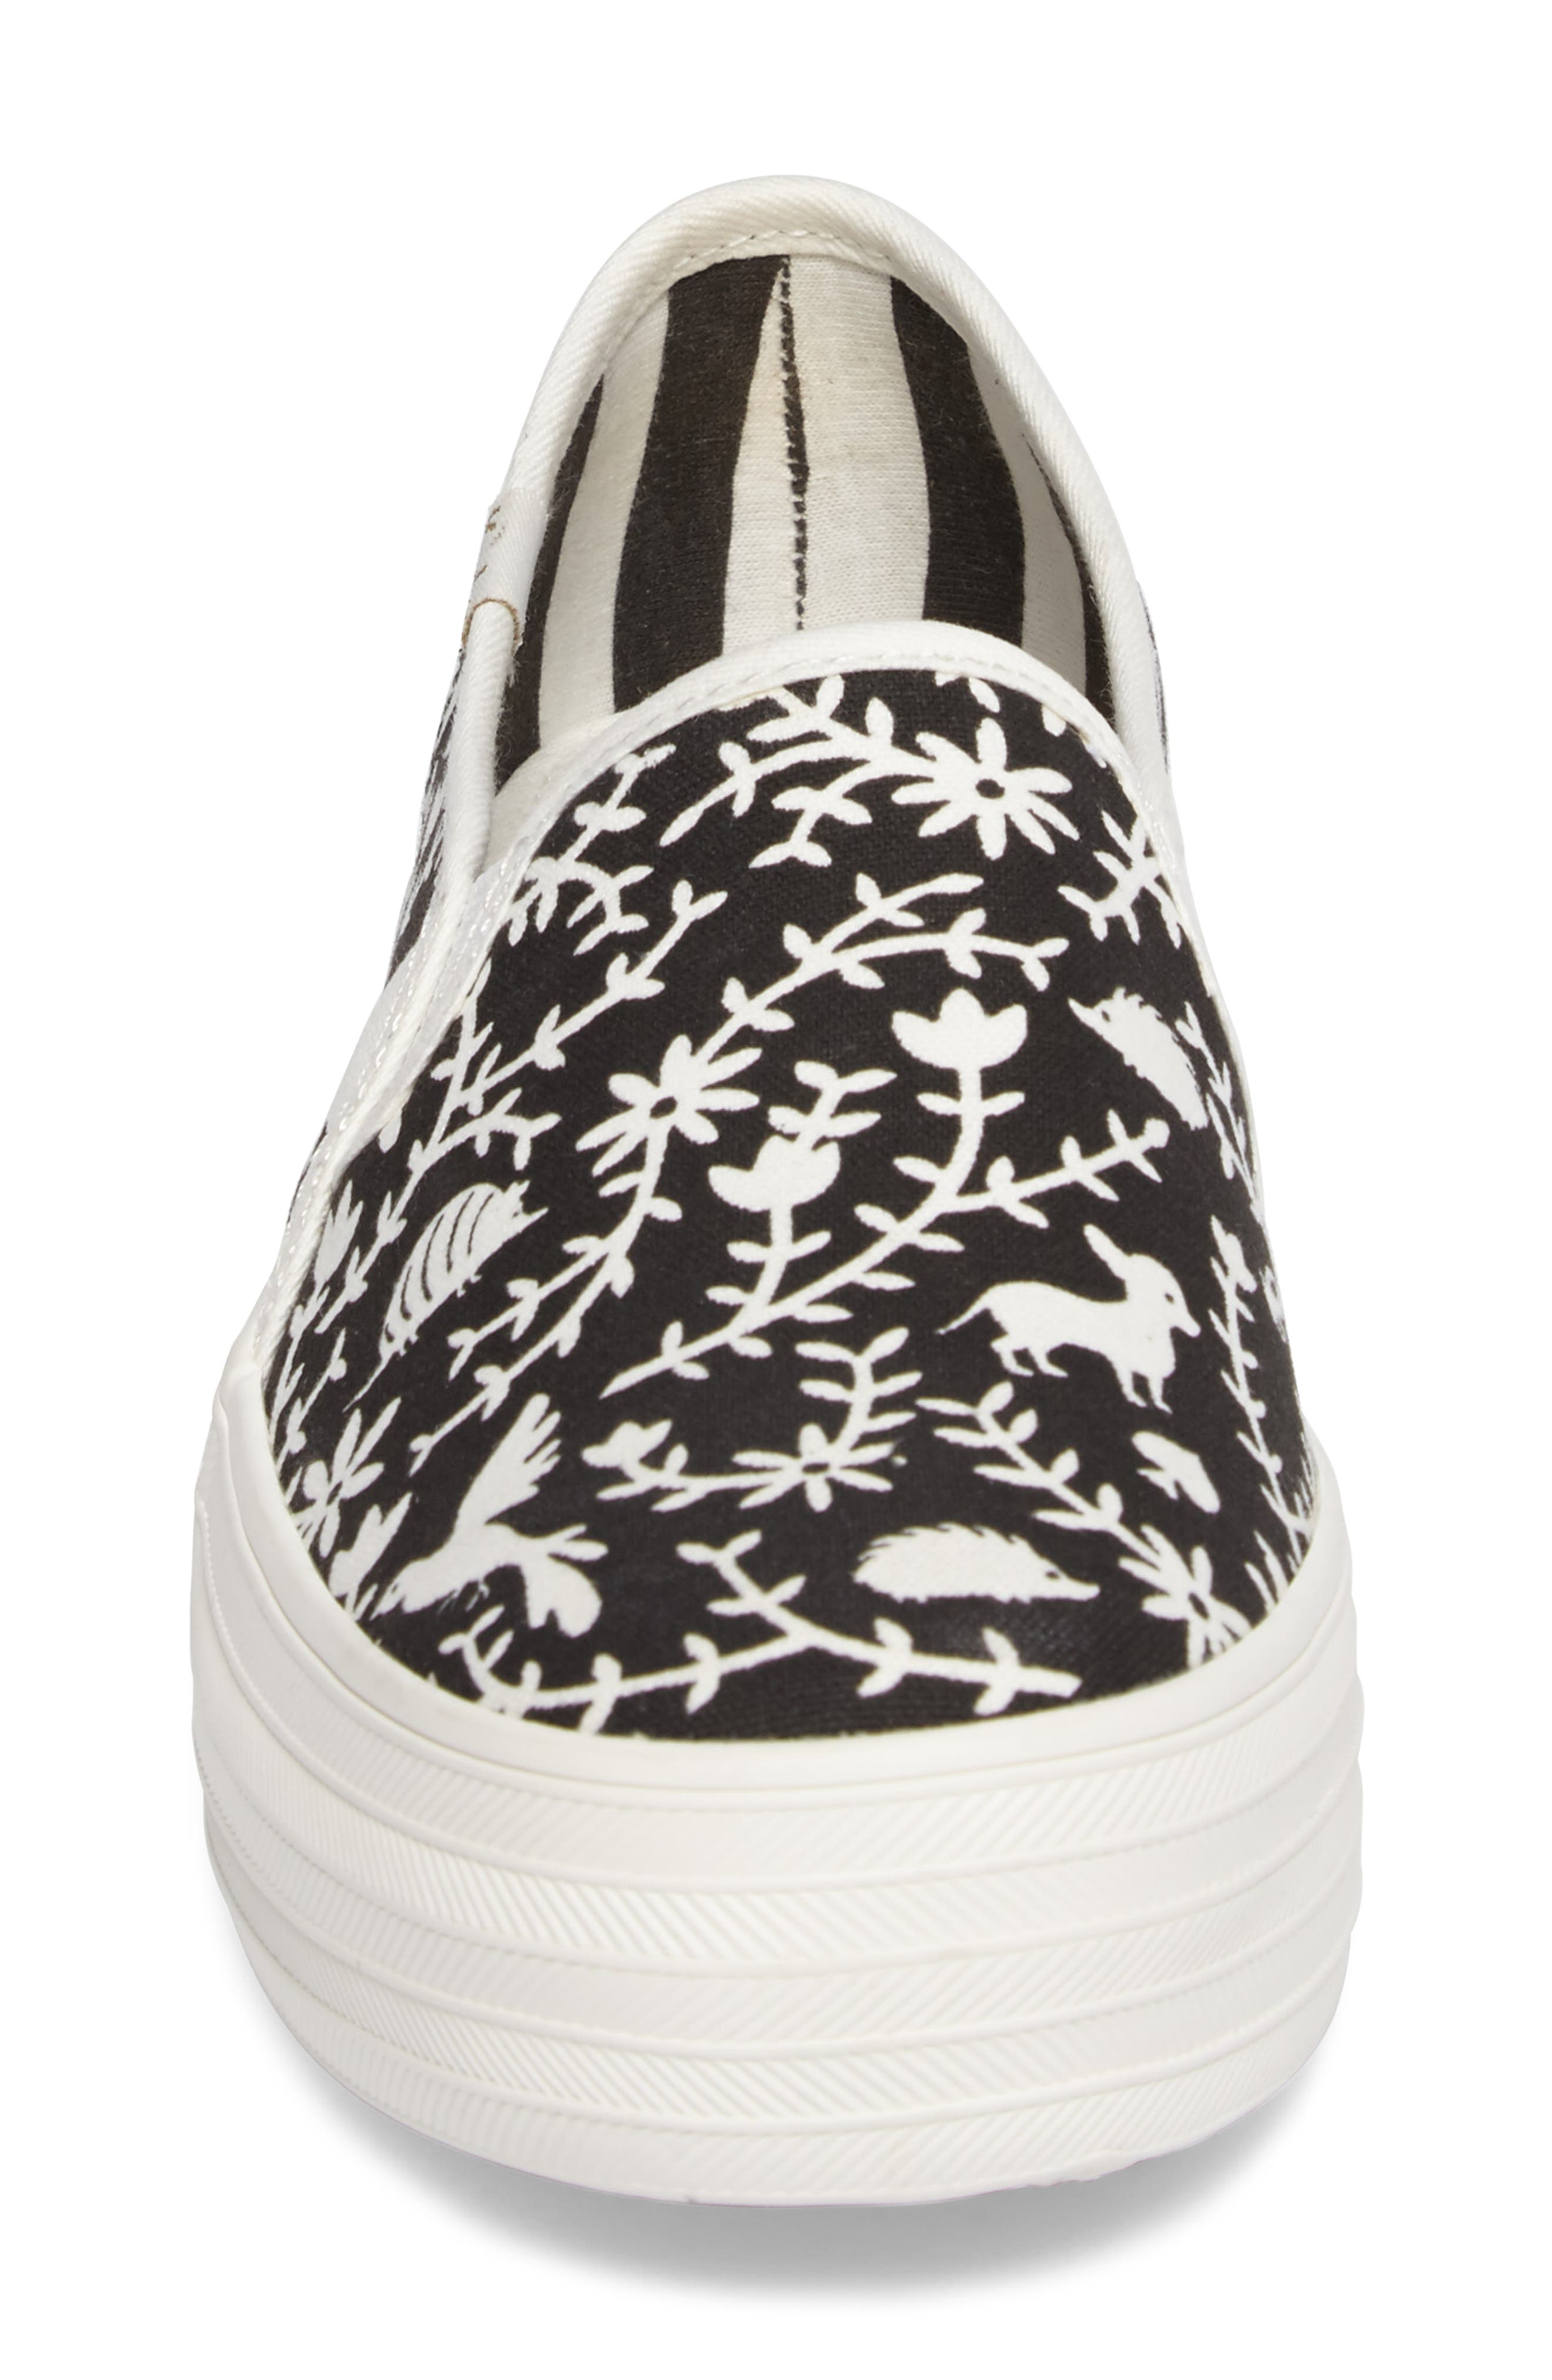 Keds<sup>®</sup> x kate spade Triple Decker Slip-On Sneaker,                             Alternate thumbnail 7, color,